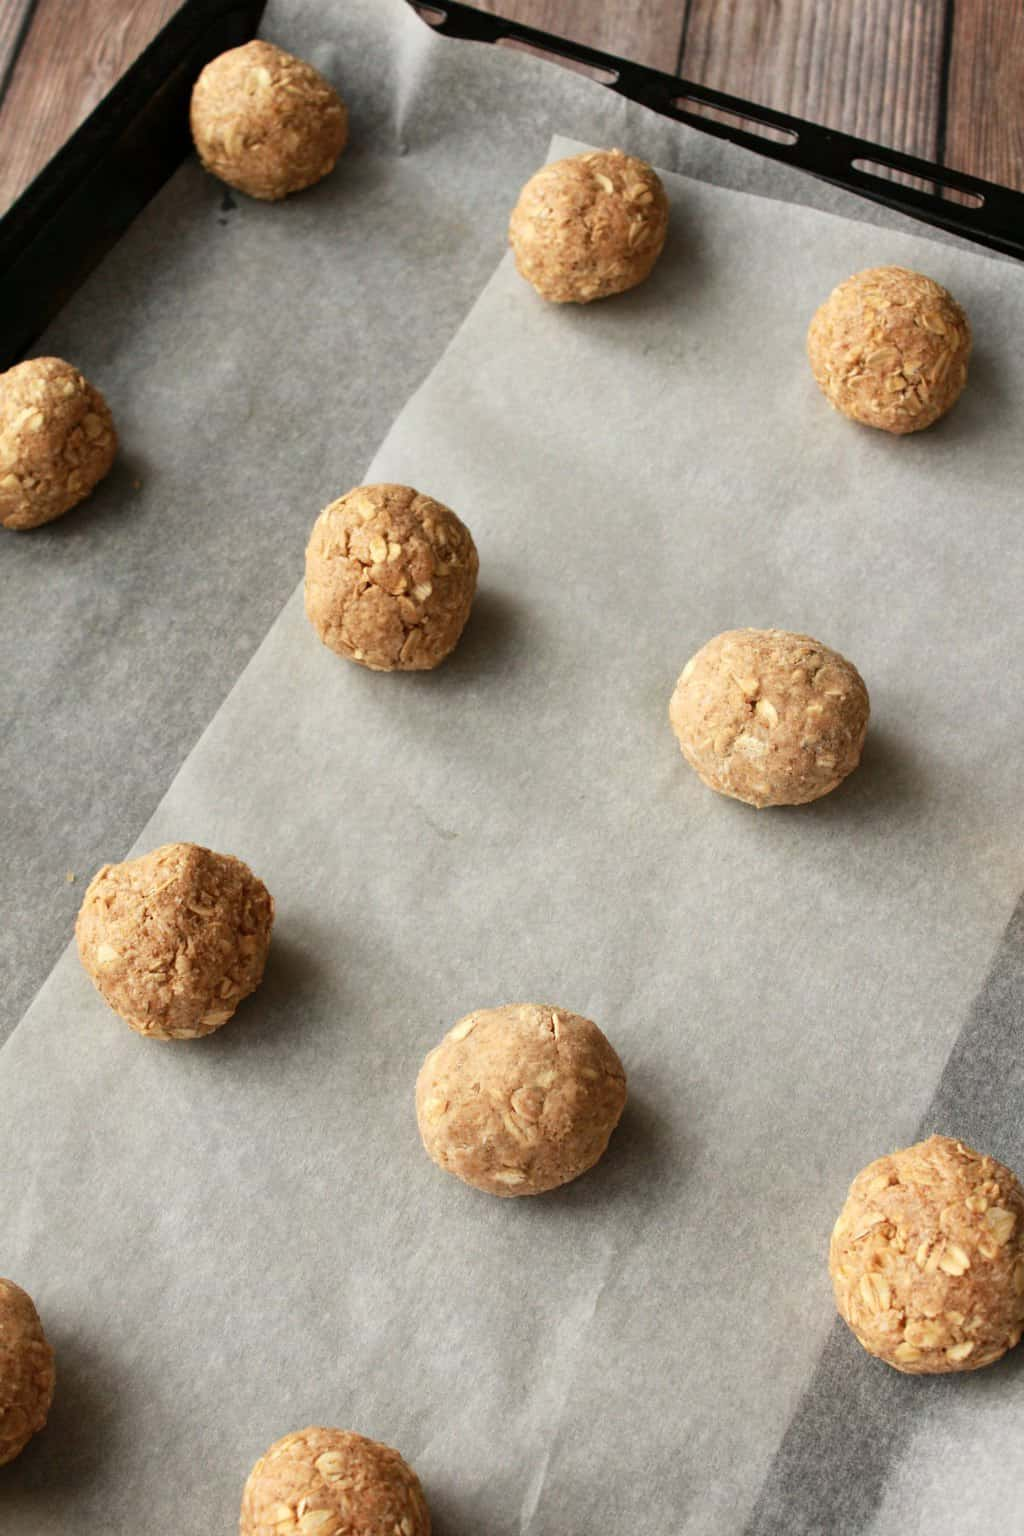 Vegan Oatmeal Cookies. Brown sugar sweetened and cinnamon infused deliciousness! #vegan #oatmeal #cookies #lovingitvegan